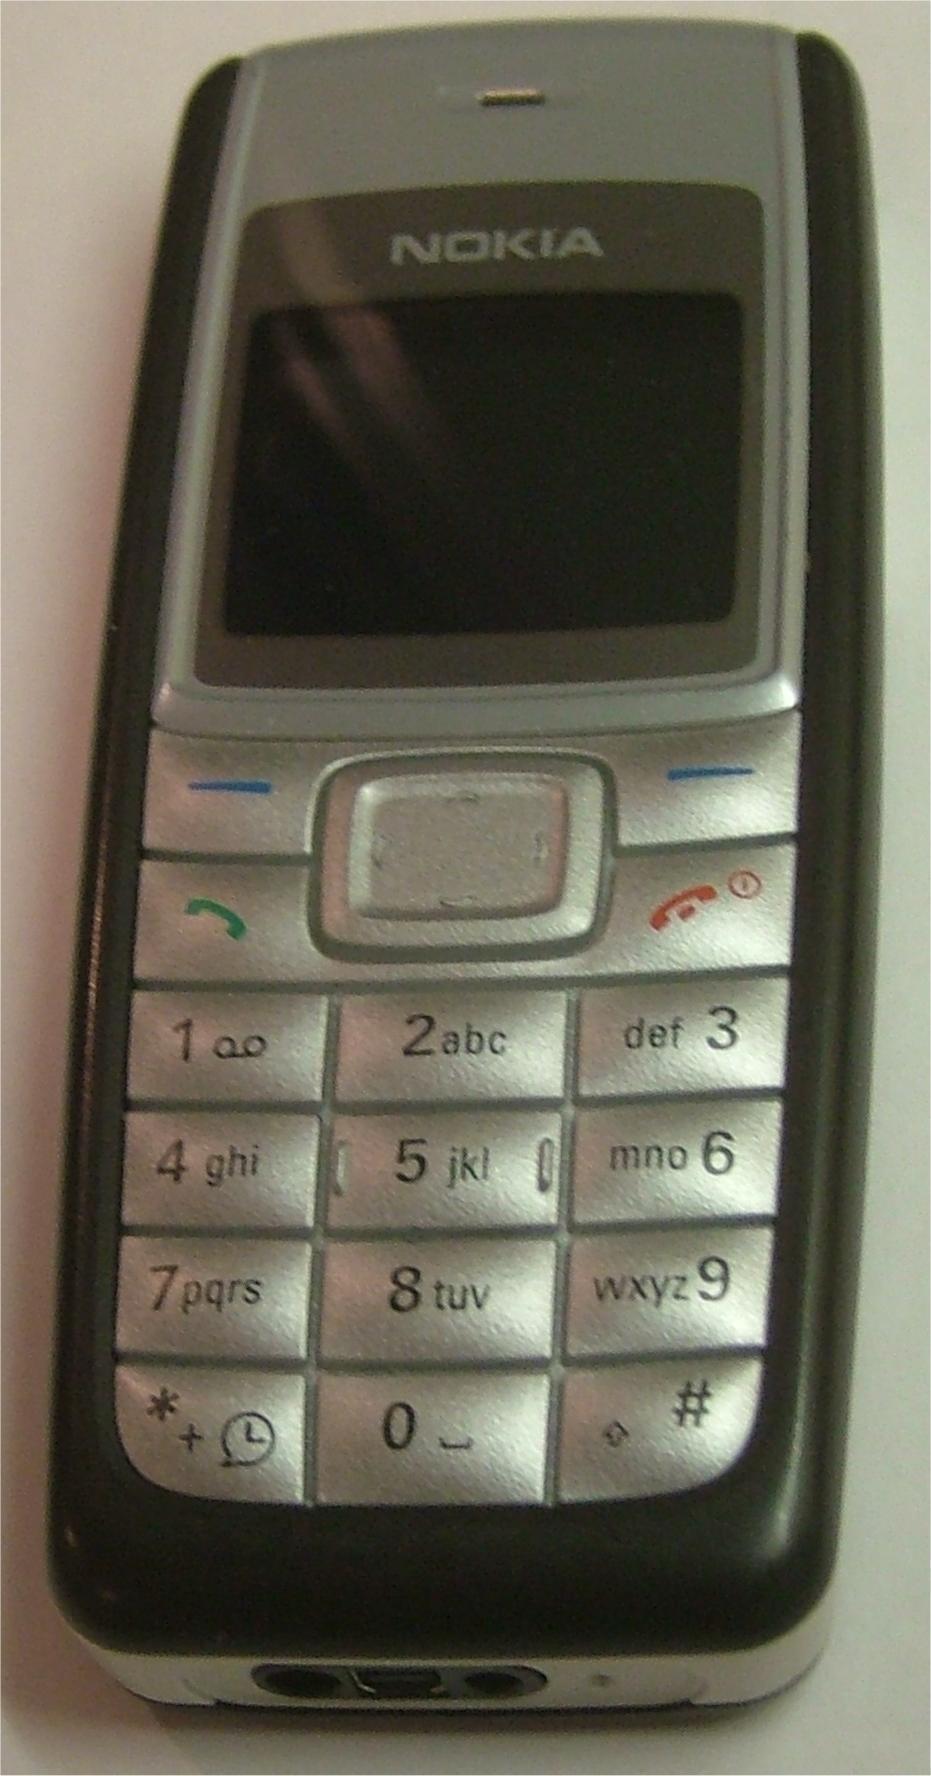 Nokia 1110 har solgt i utrolige 250 millioner eksemplarer siden den kom i 2005.Foto: Wikipedia, Public Domain